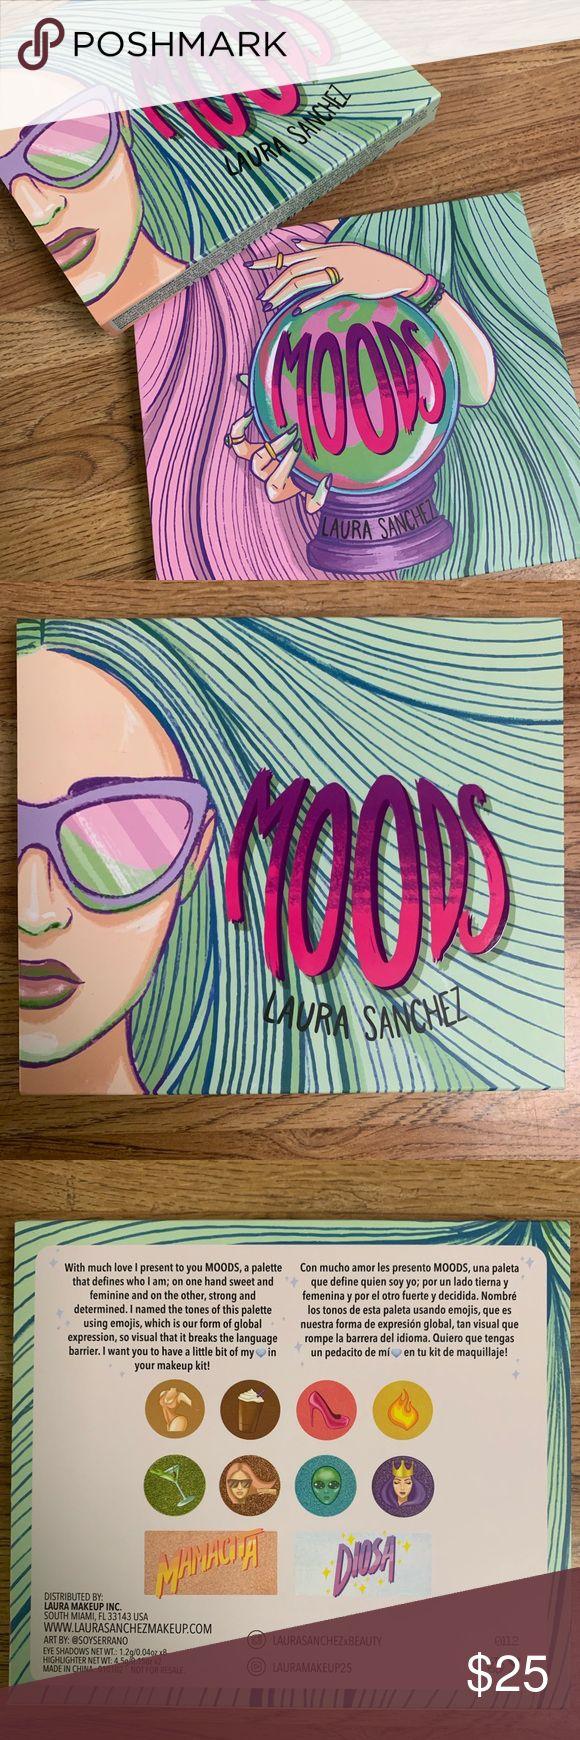 Host Pick🔥Laura Sanchez moods eyeshadow palette